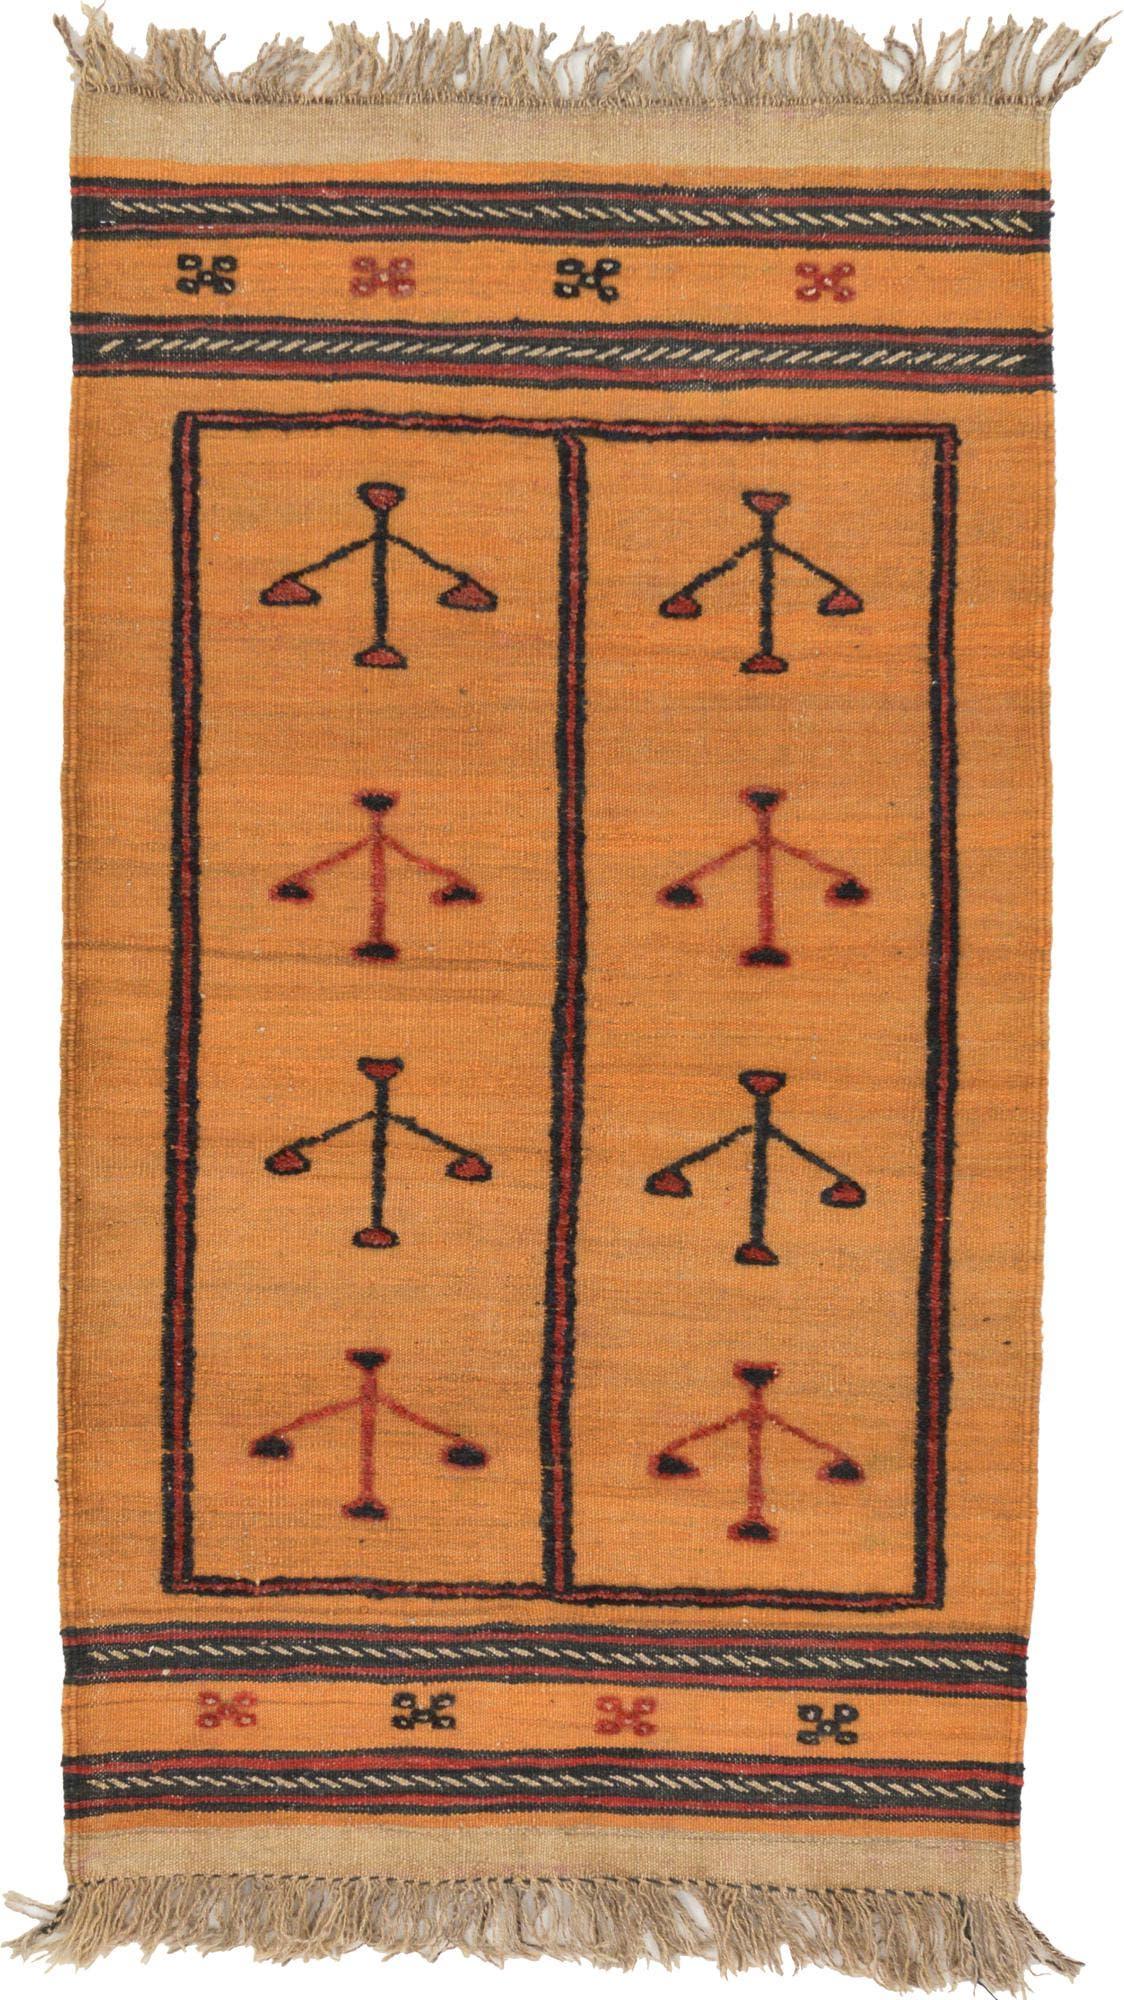 2' 6 x 4' 7 Kilim Afghan Rug main image